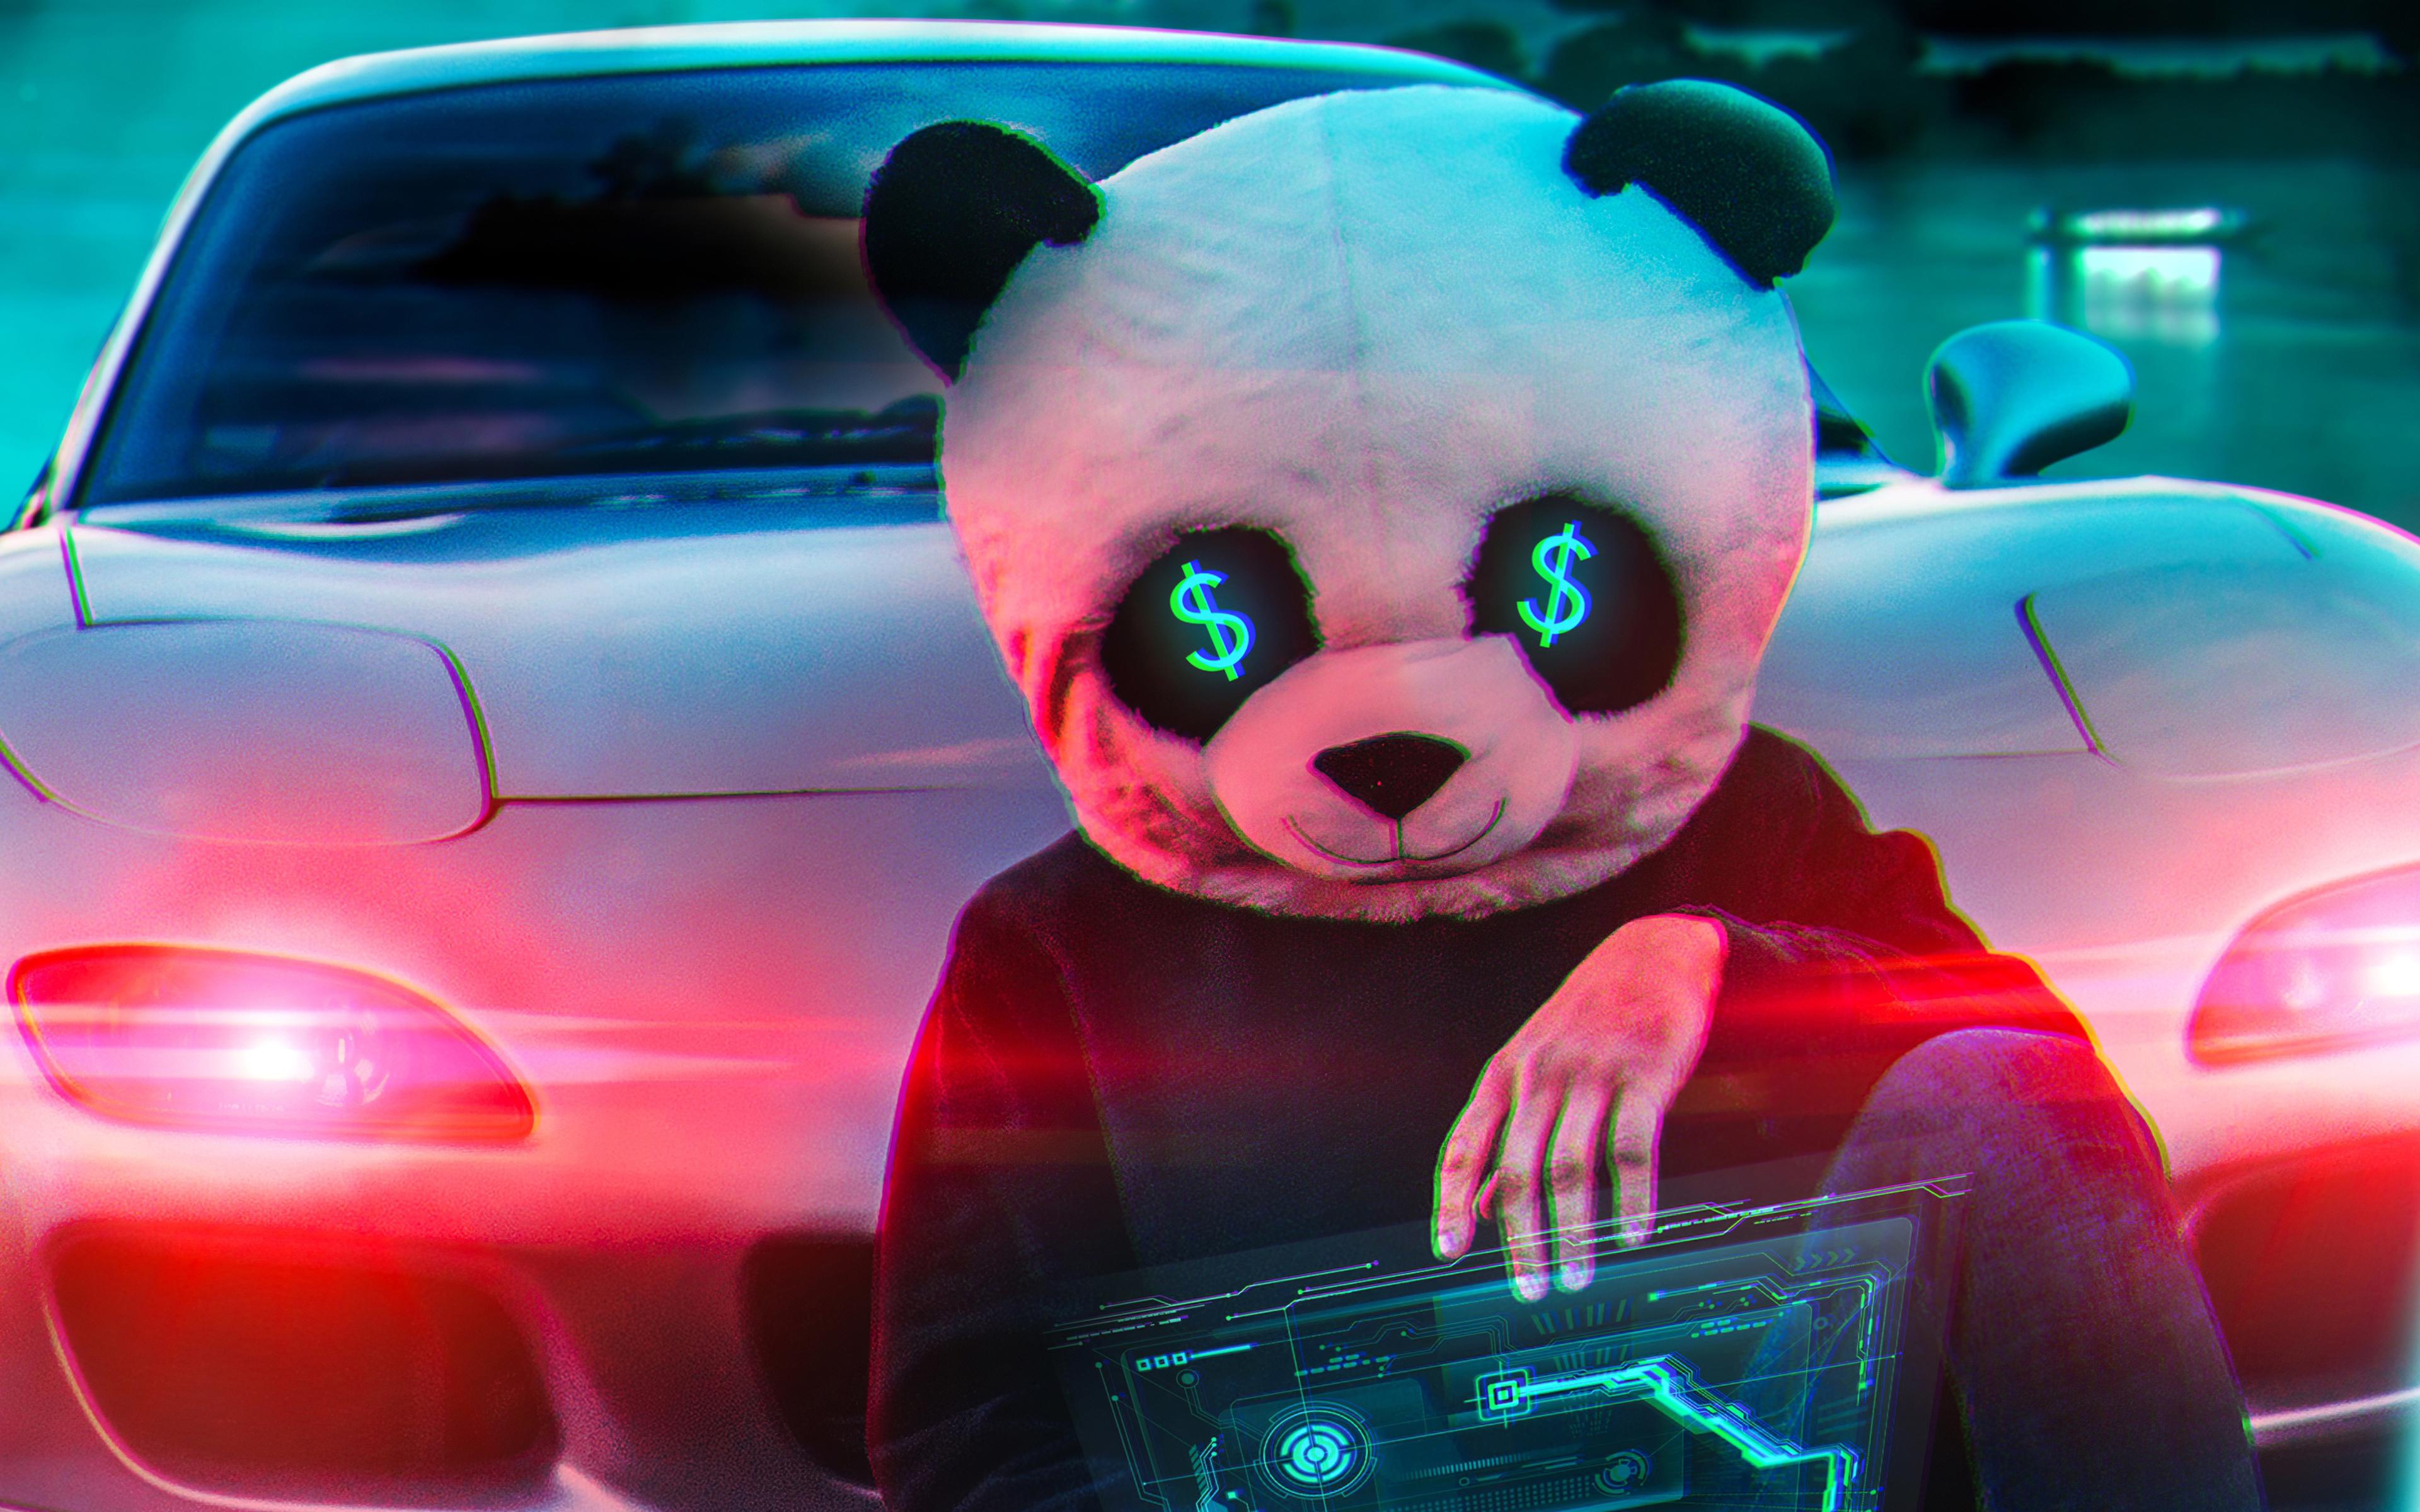 panda-money-guy-4k-80.jpg